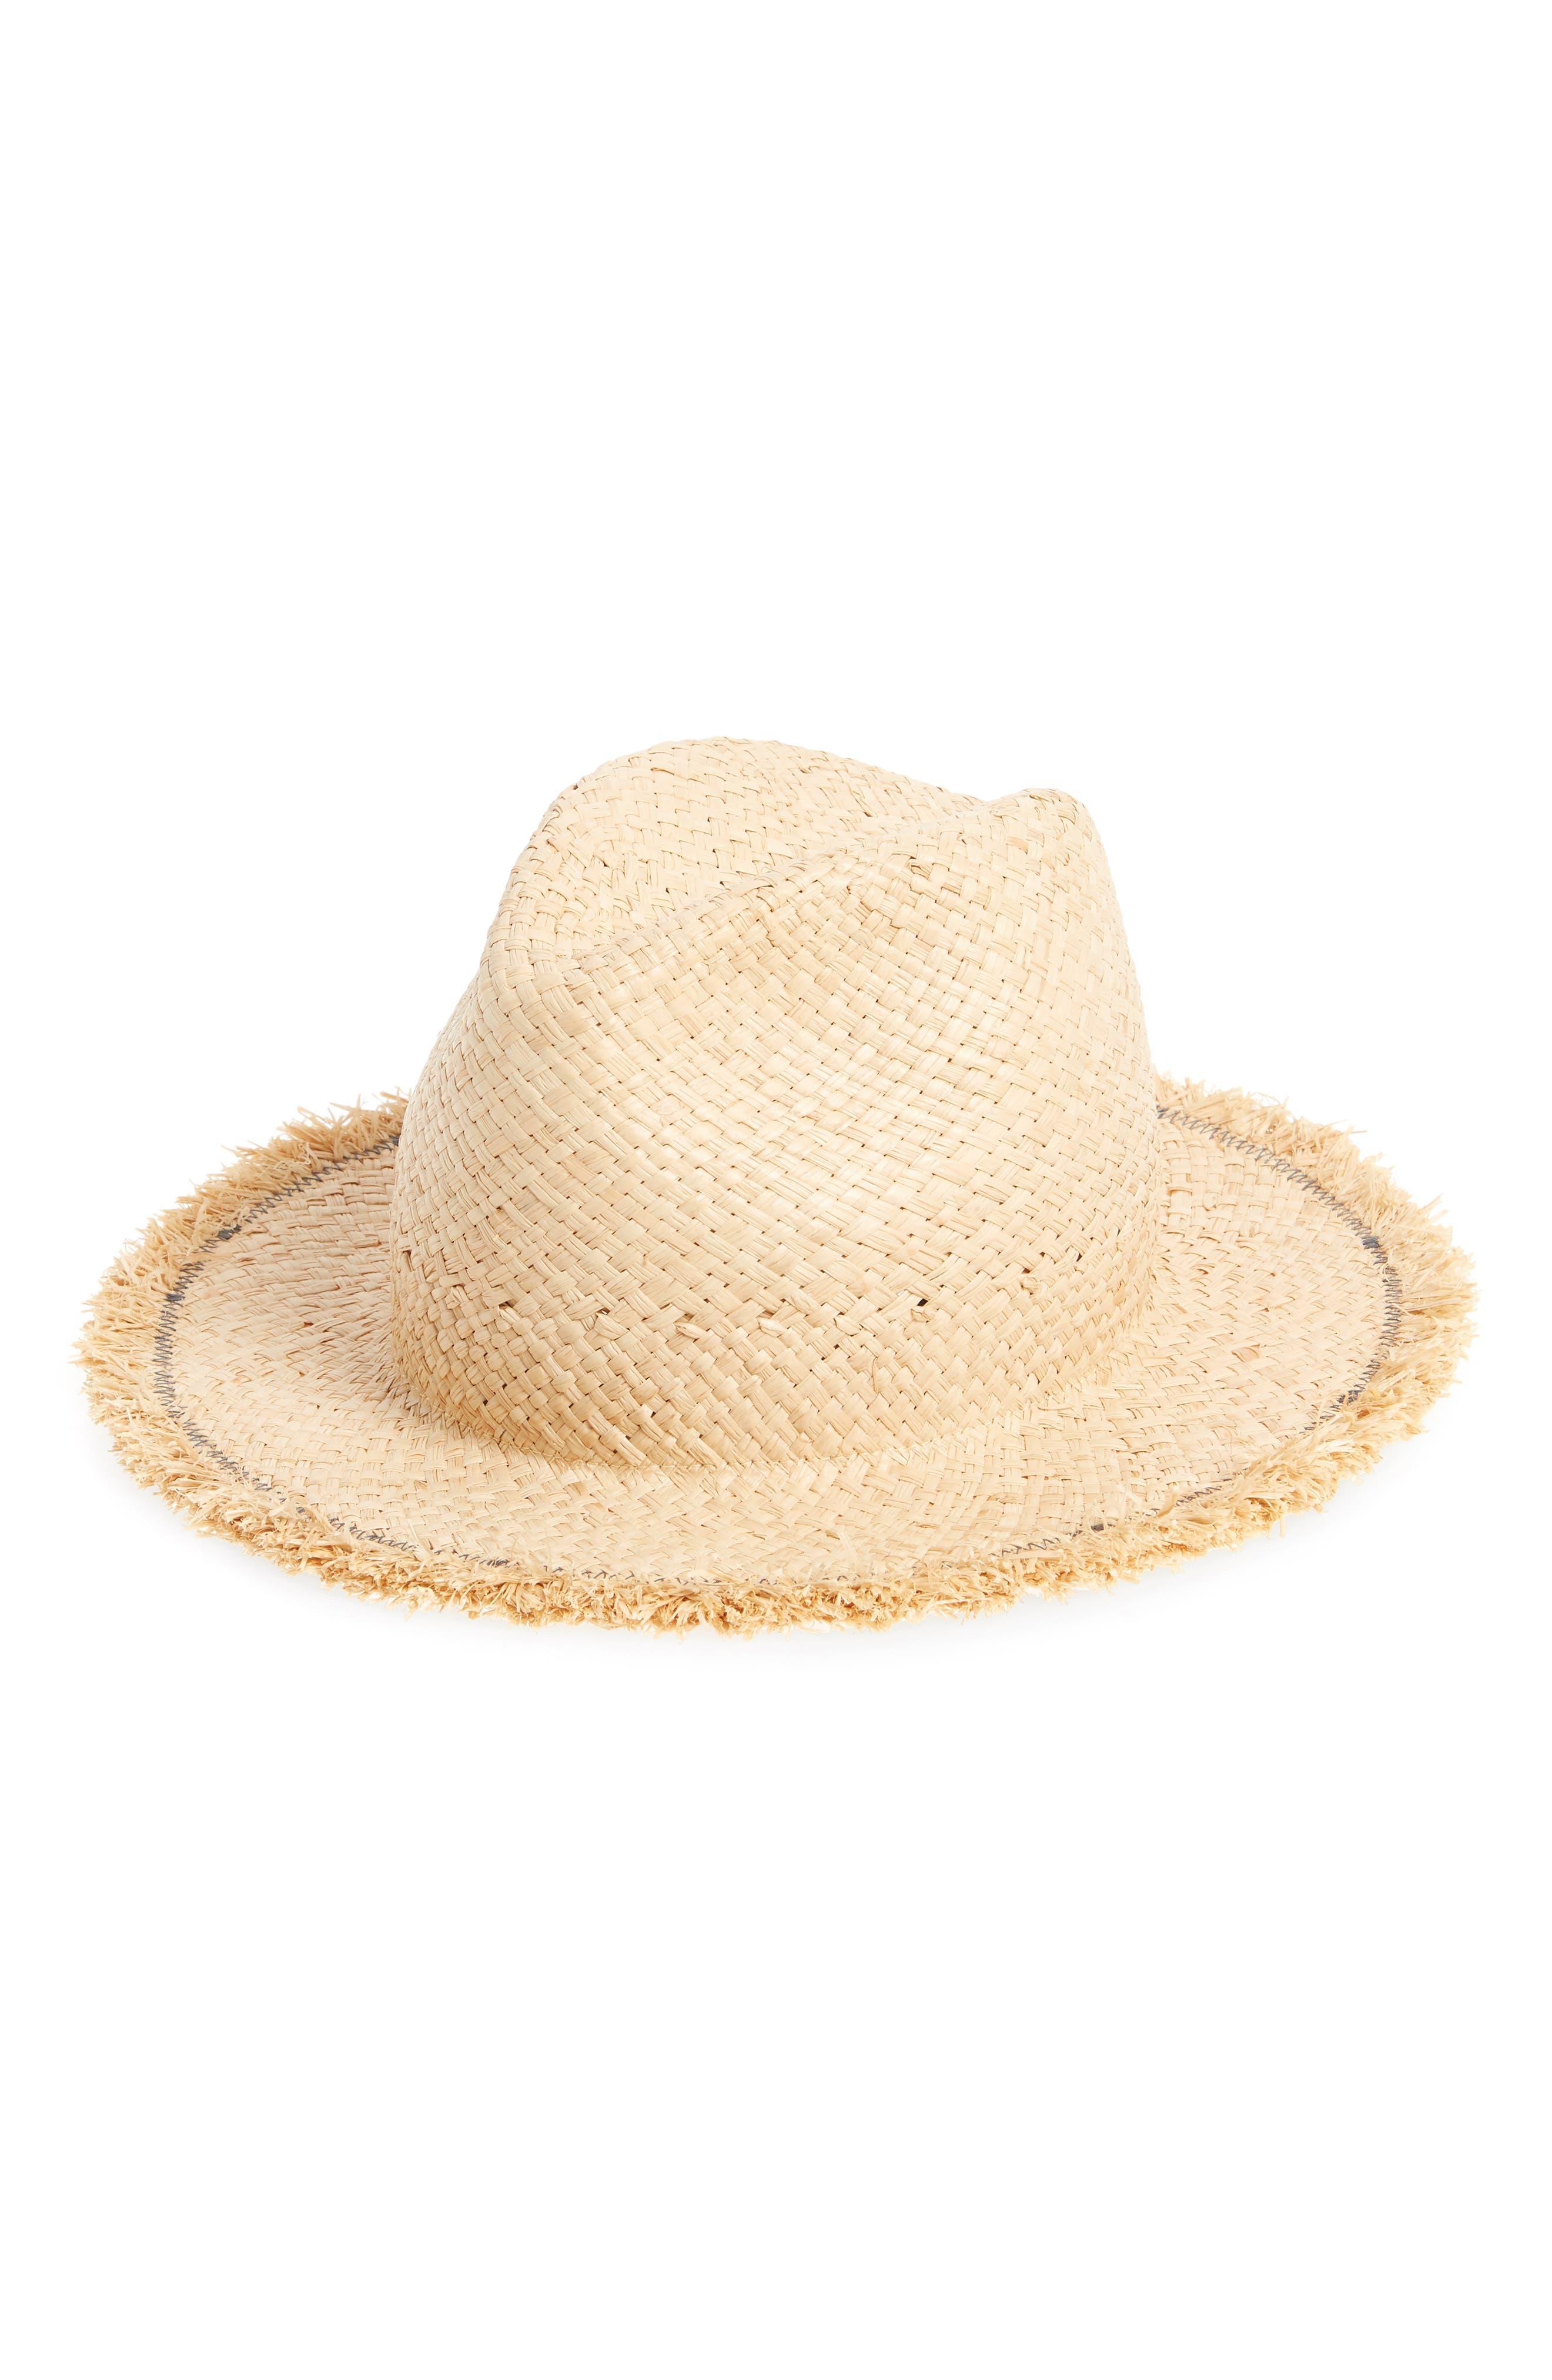 LOLA HATS DAD'S STRAW HAT - BROWN